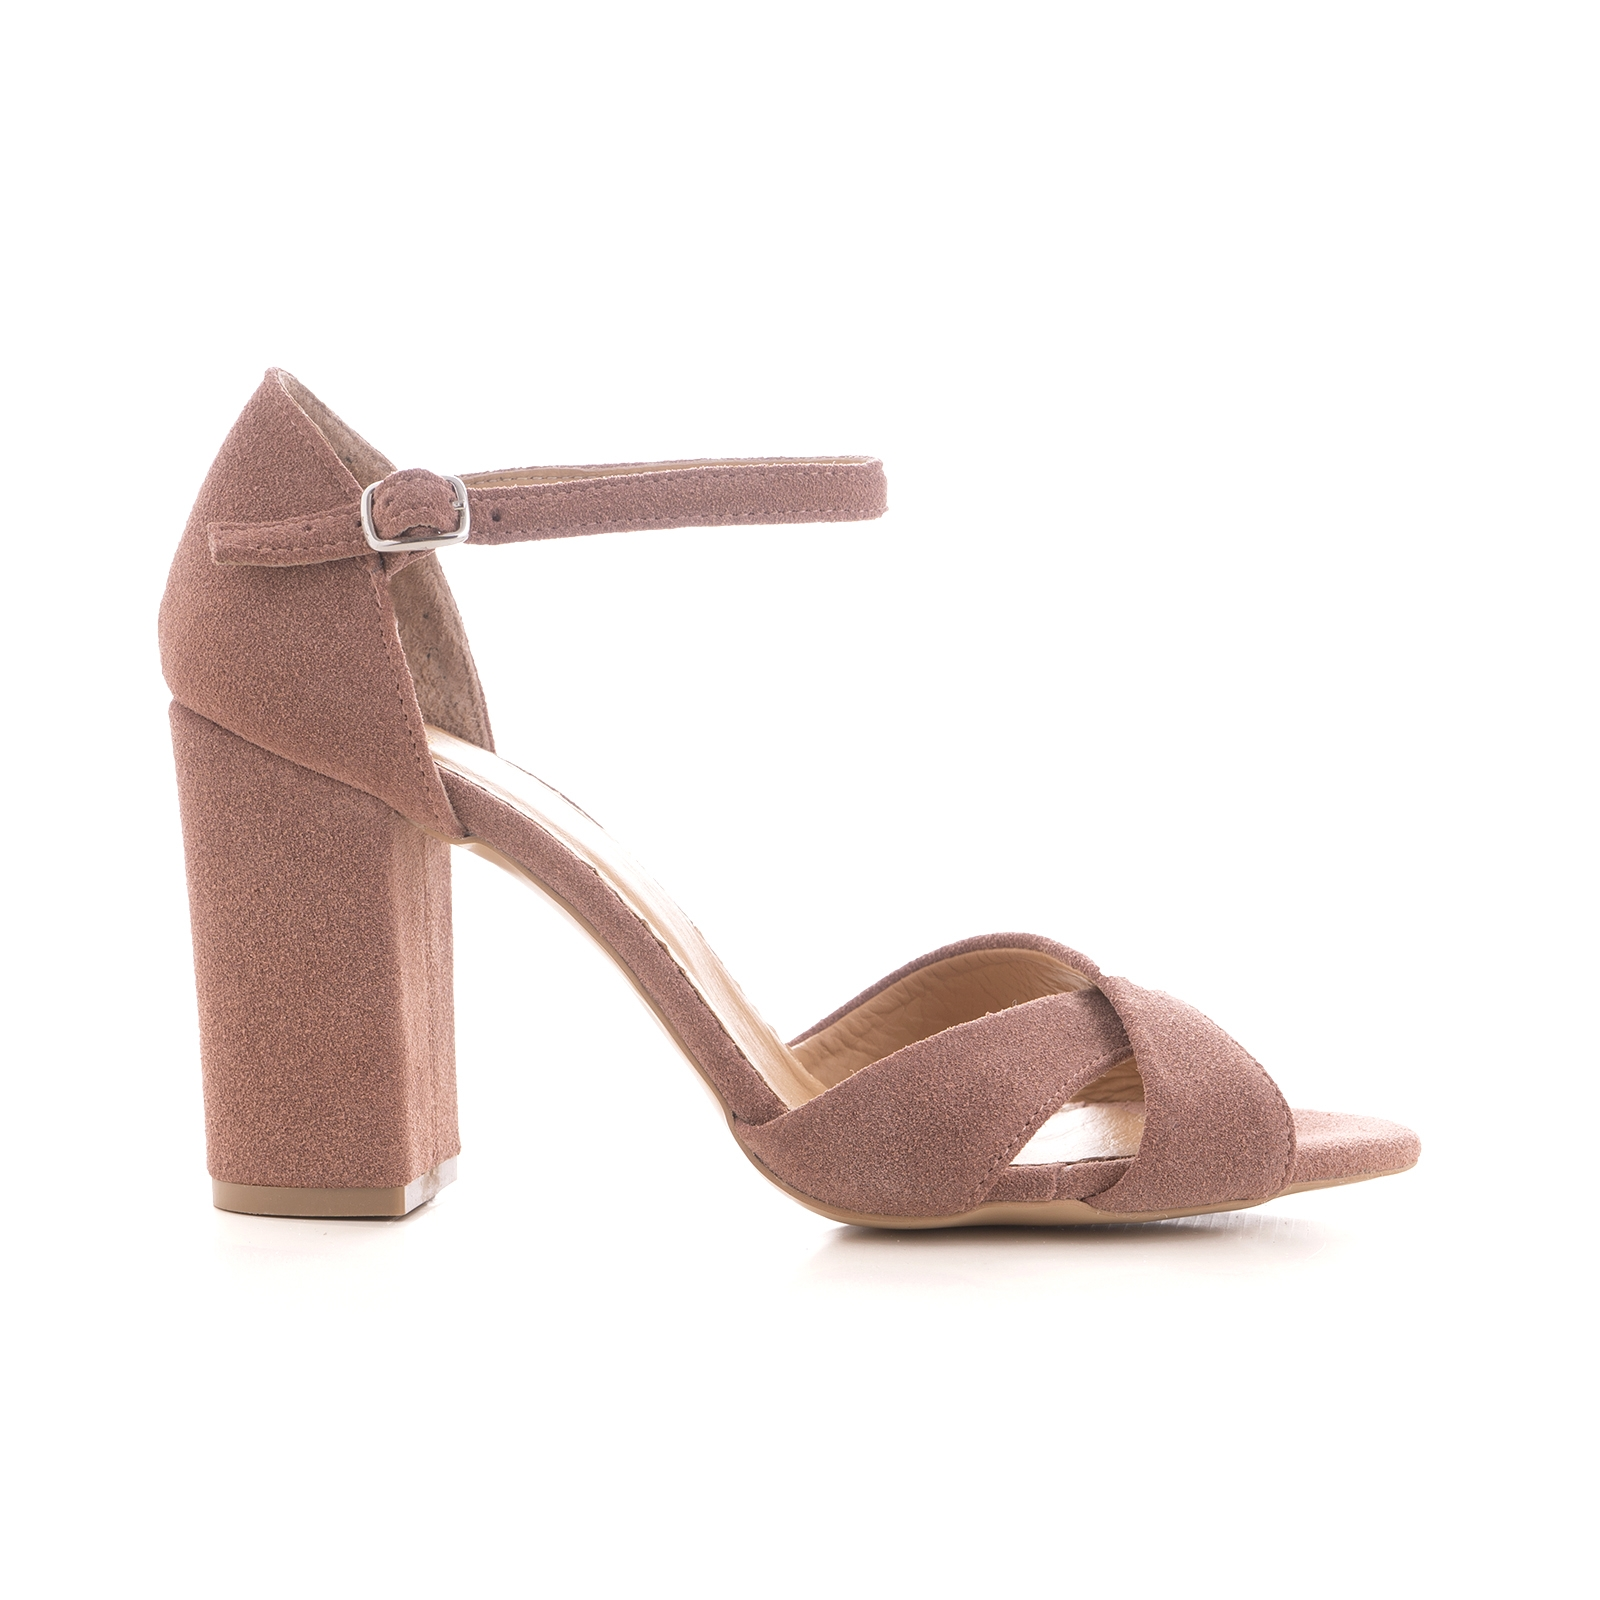 Sandale cu toc gros, din piele intoarsa bej si aurie